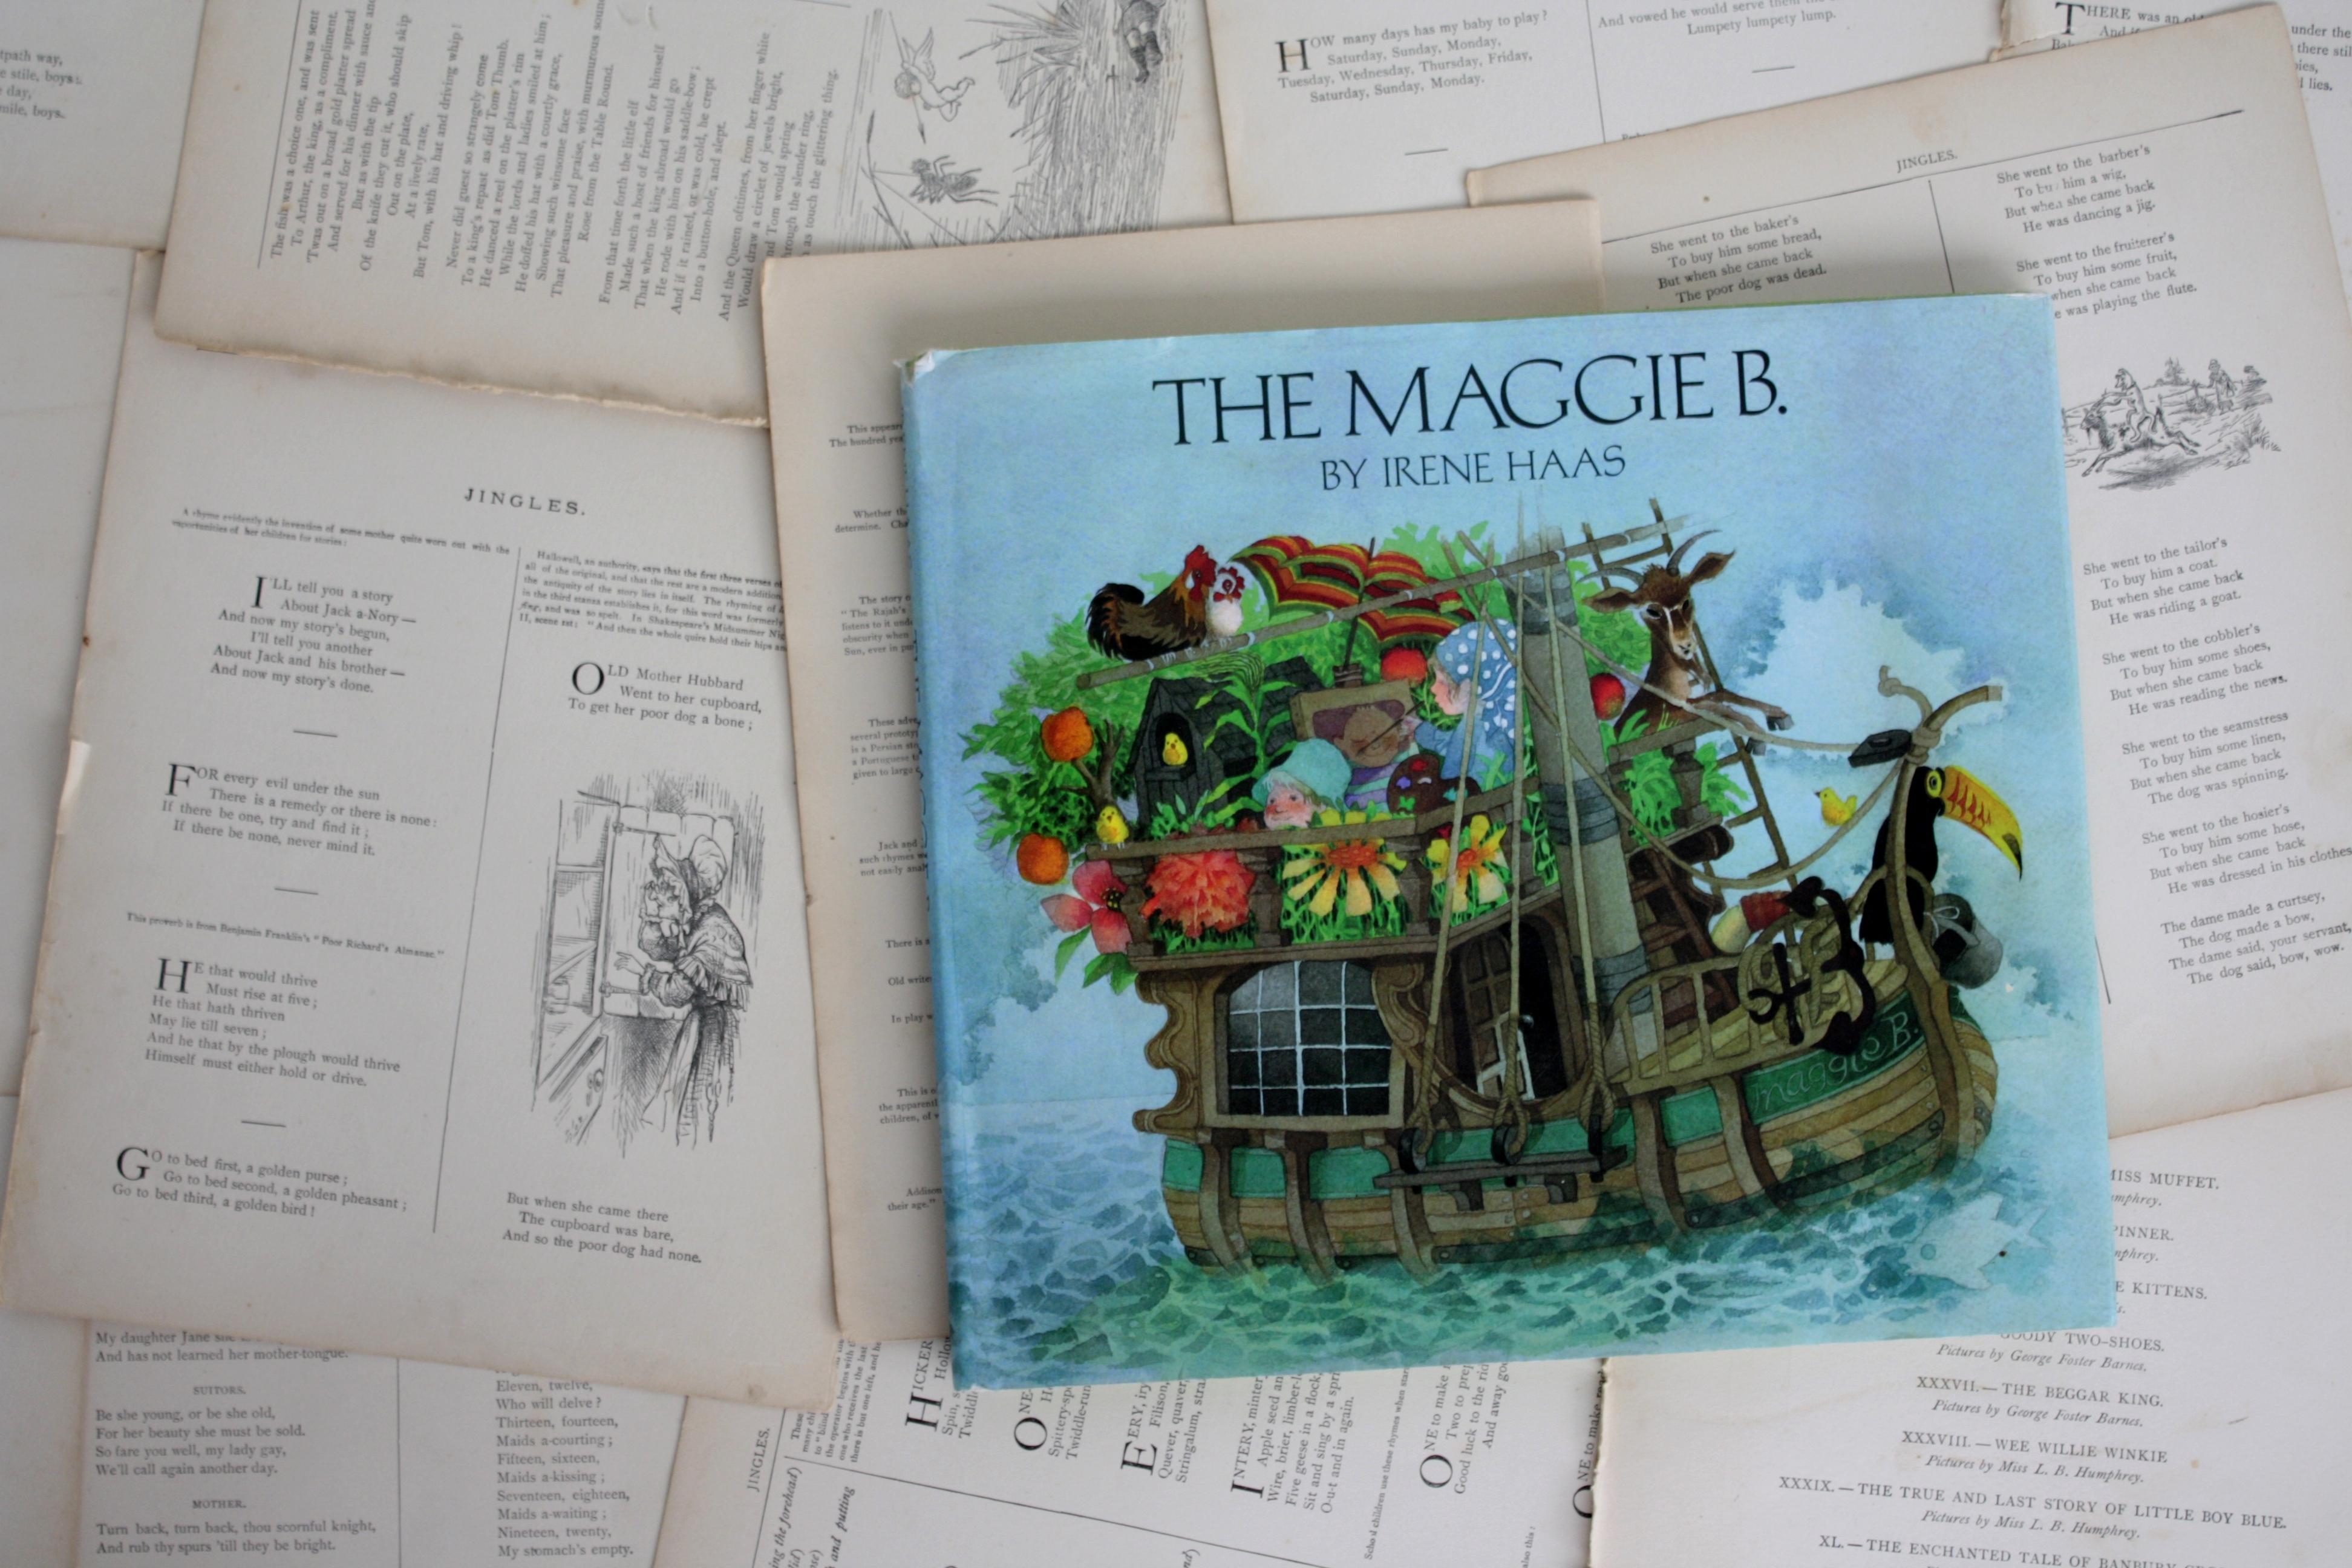 The Maggie B. | Irene Haas